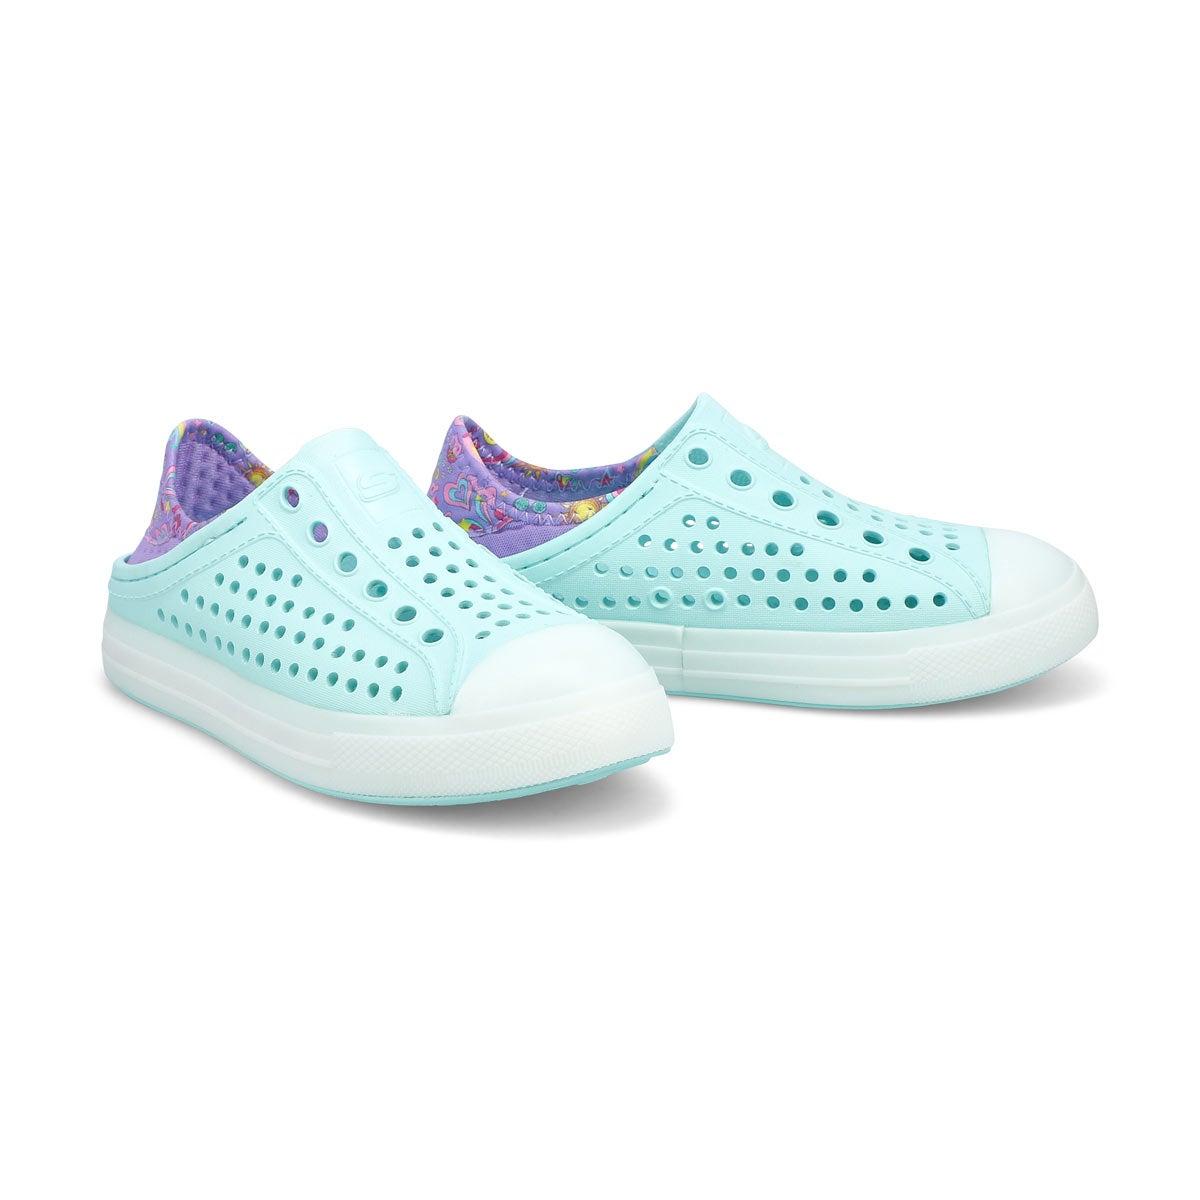 Girls' Guzman Flash Shoe - Turquoise/Lavender